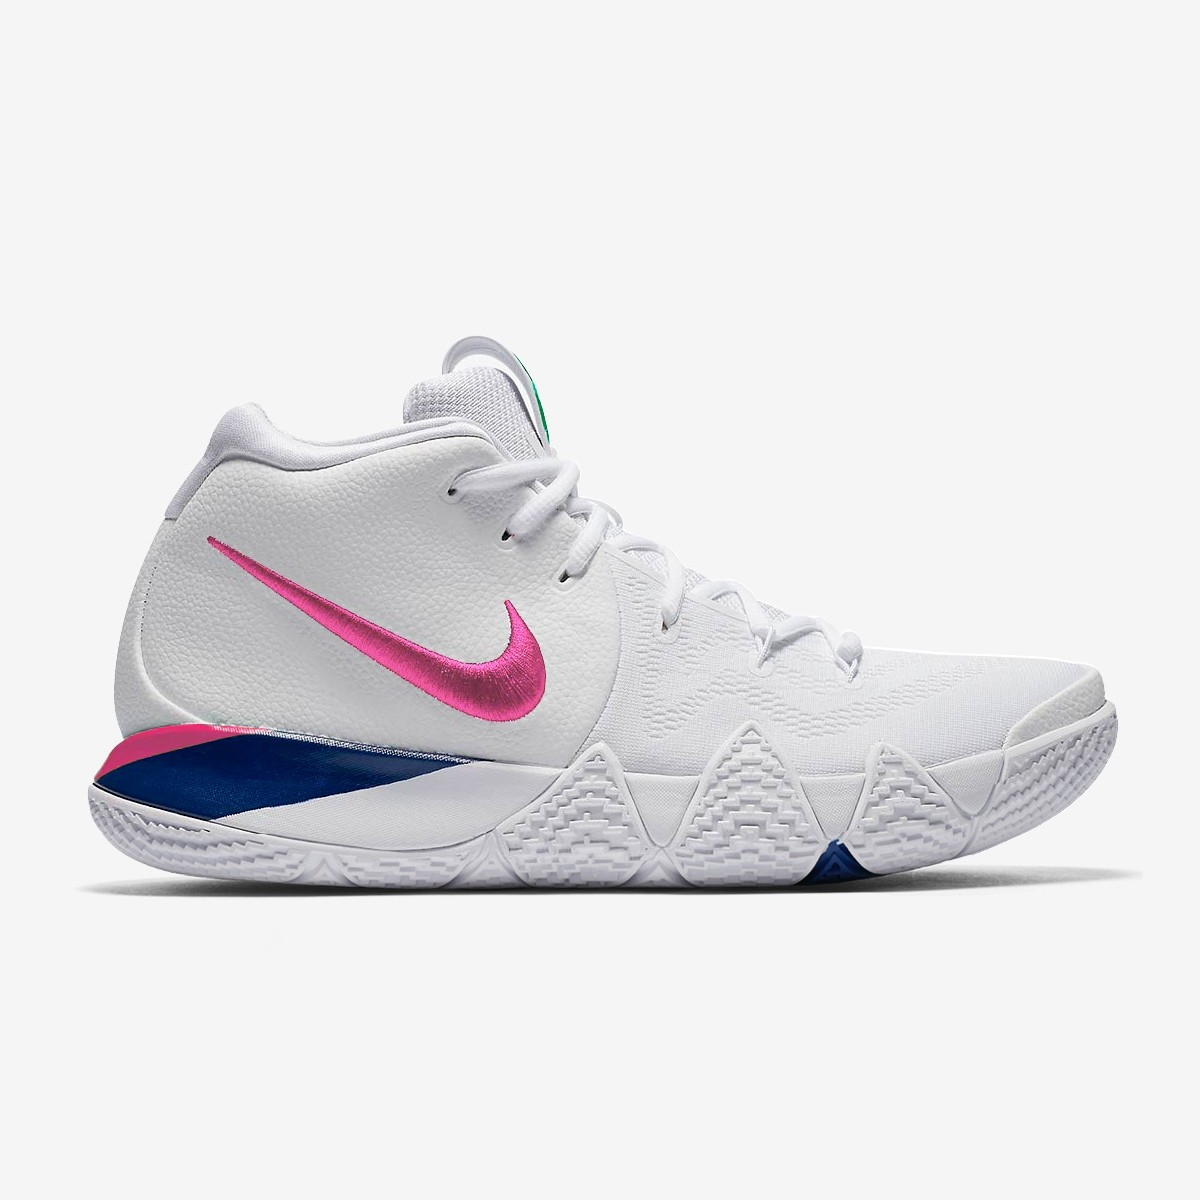 Nike Kyrie 4 'Last Pink Custom' X MelonKicks